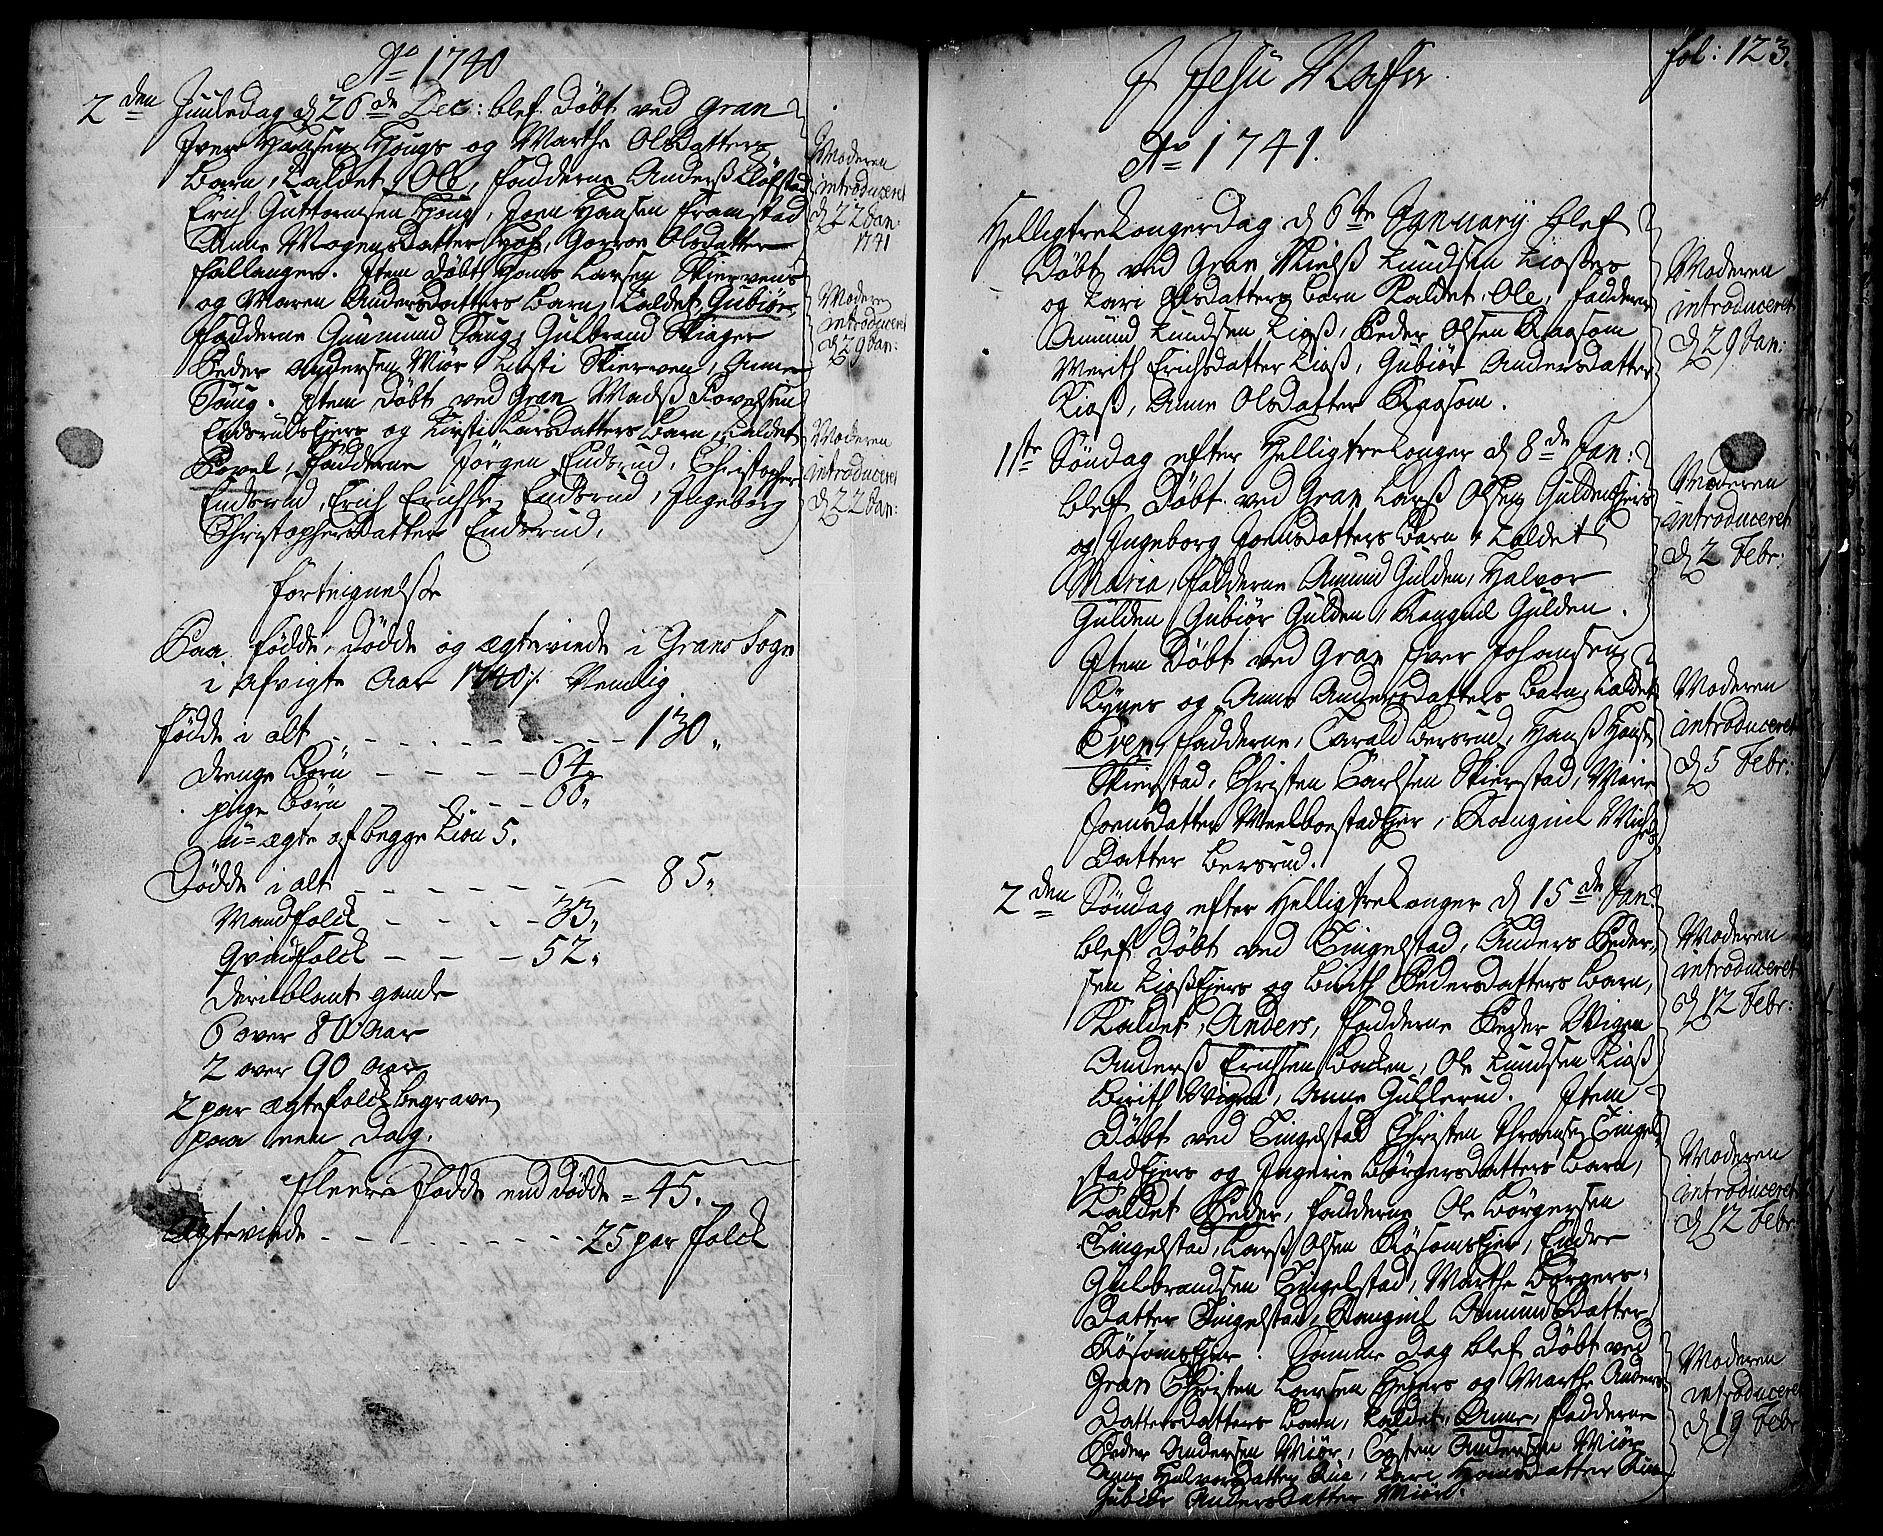 SAH, Gran prestekontor, Ministerialbok nr. 2, 1732-1744, s. 123